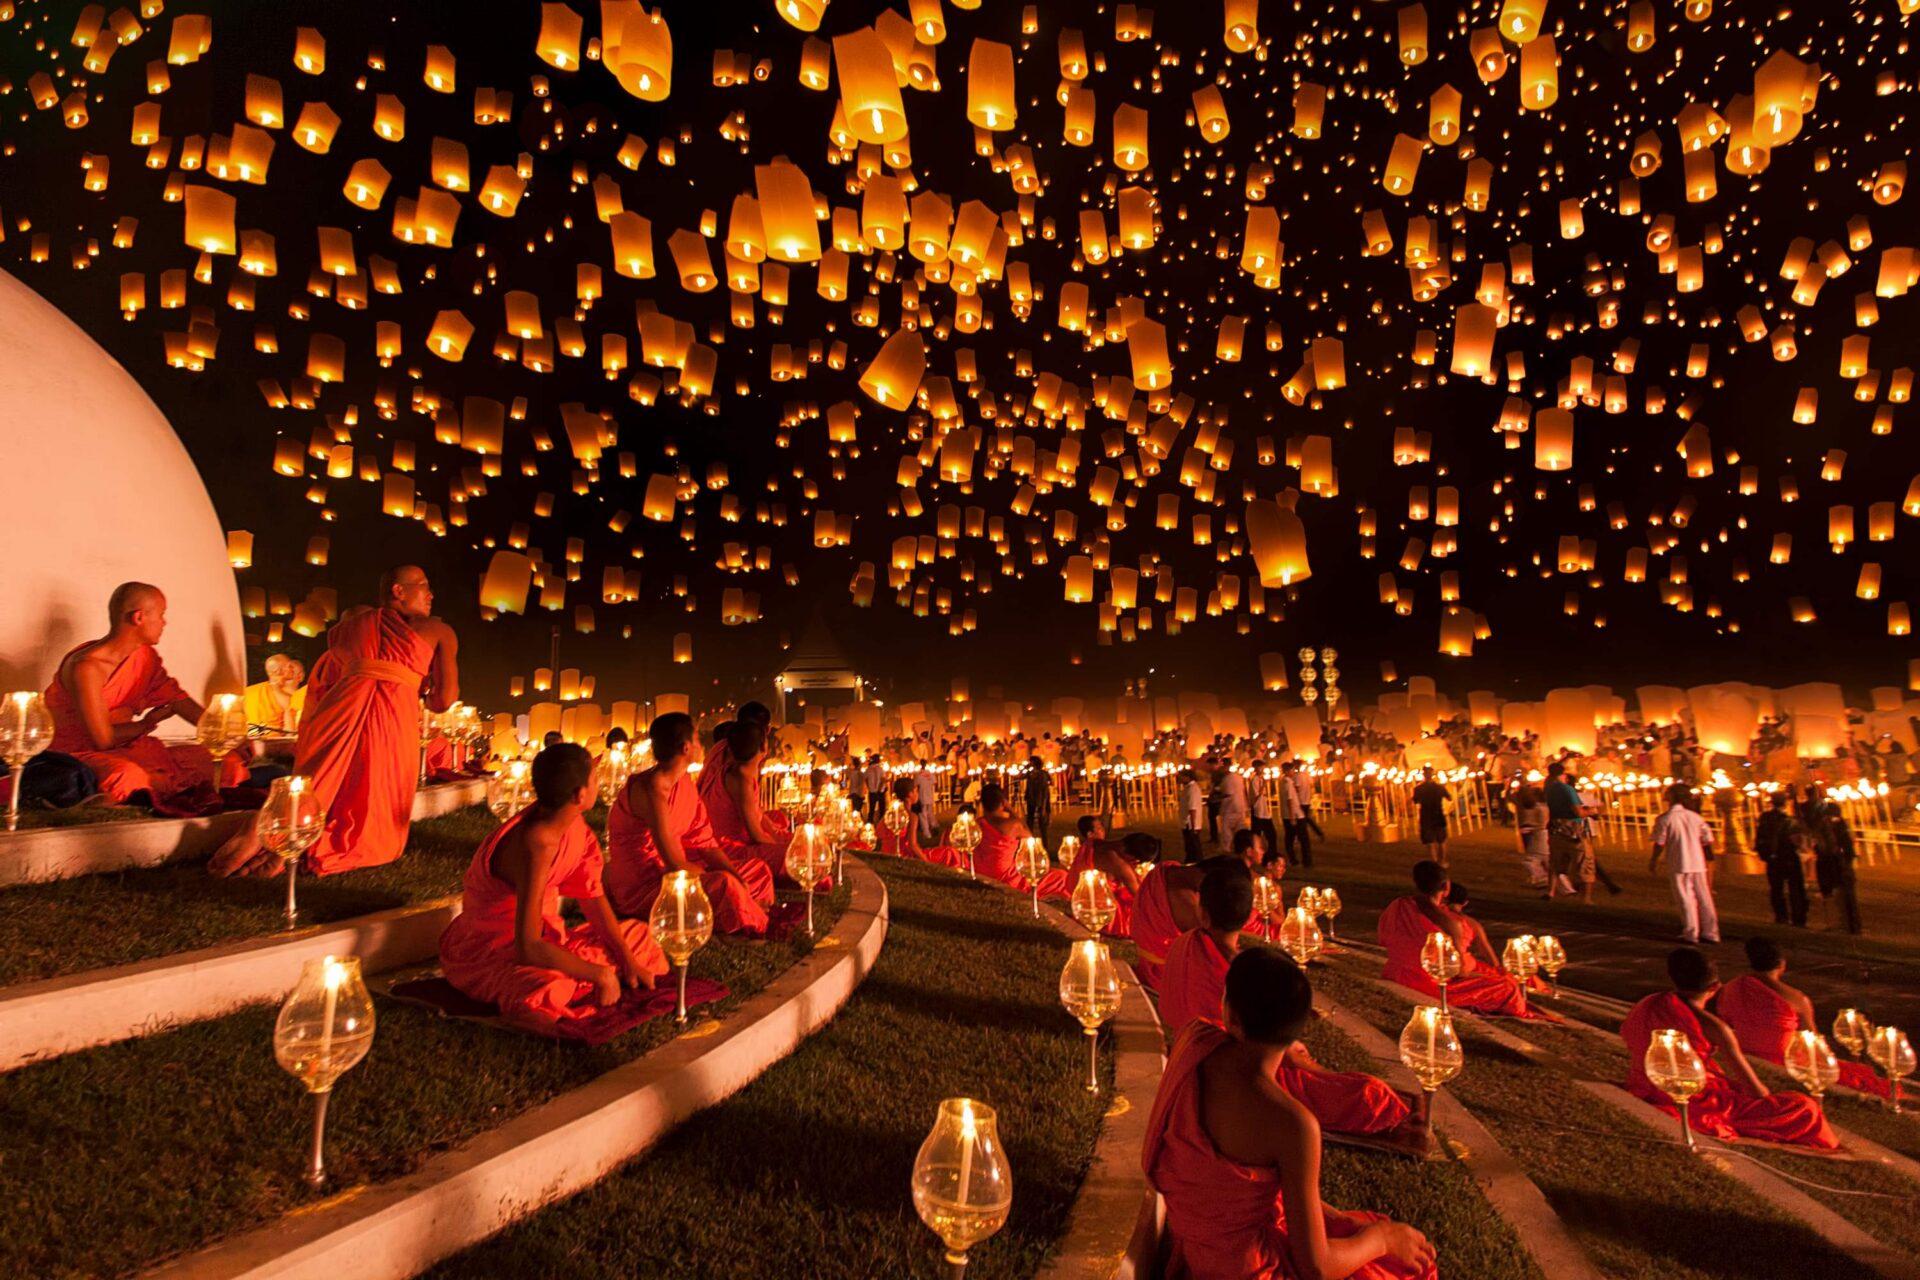 Ano CES datovania pangalan ng bansang Mjanmarsko WA štát datovania zákony